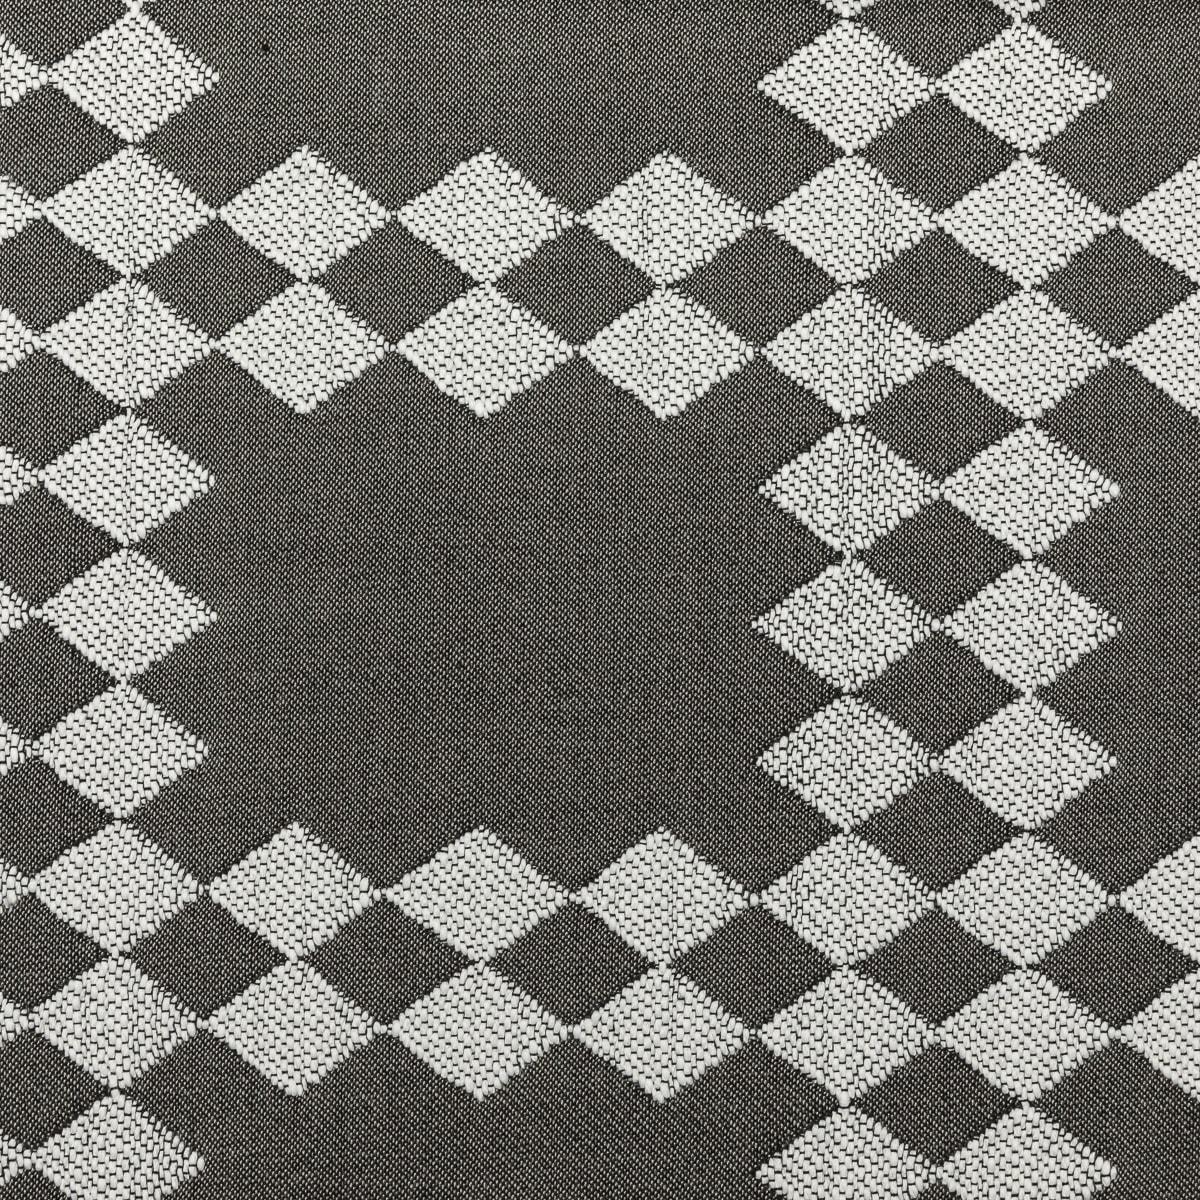 Dark grey chess